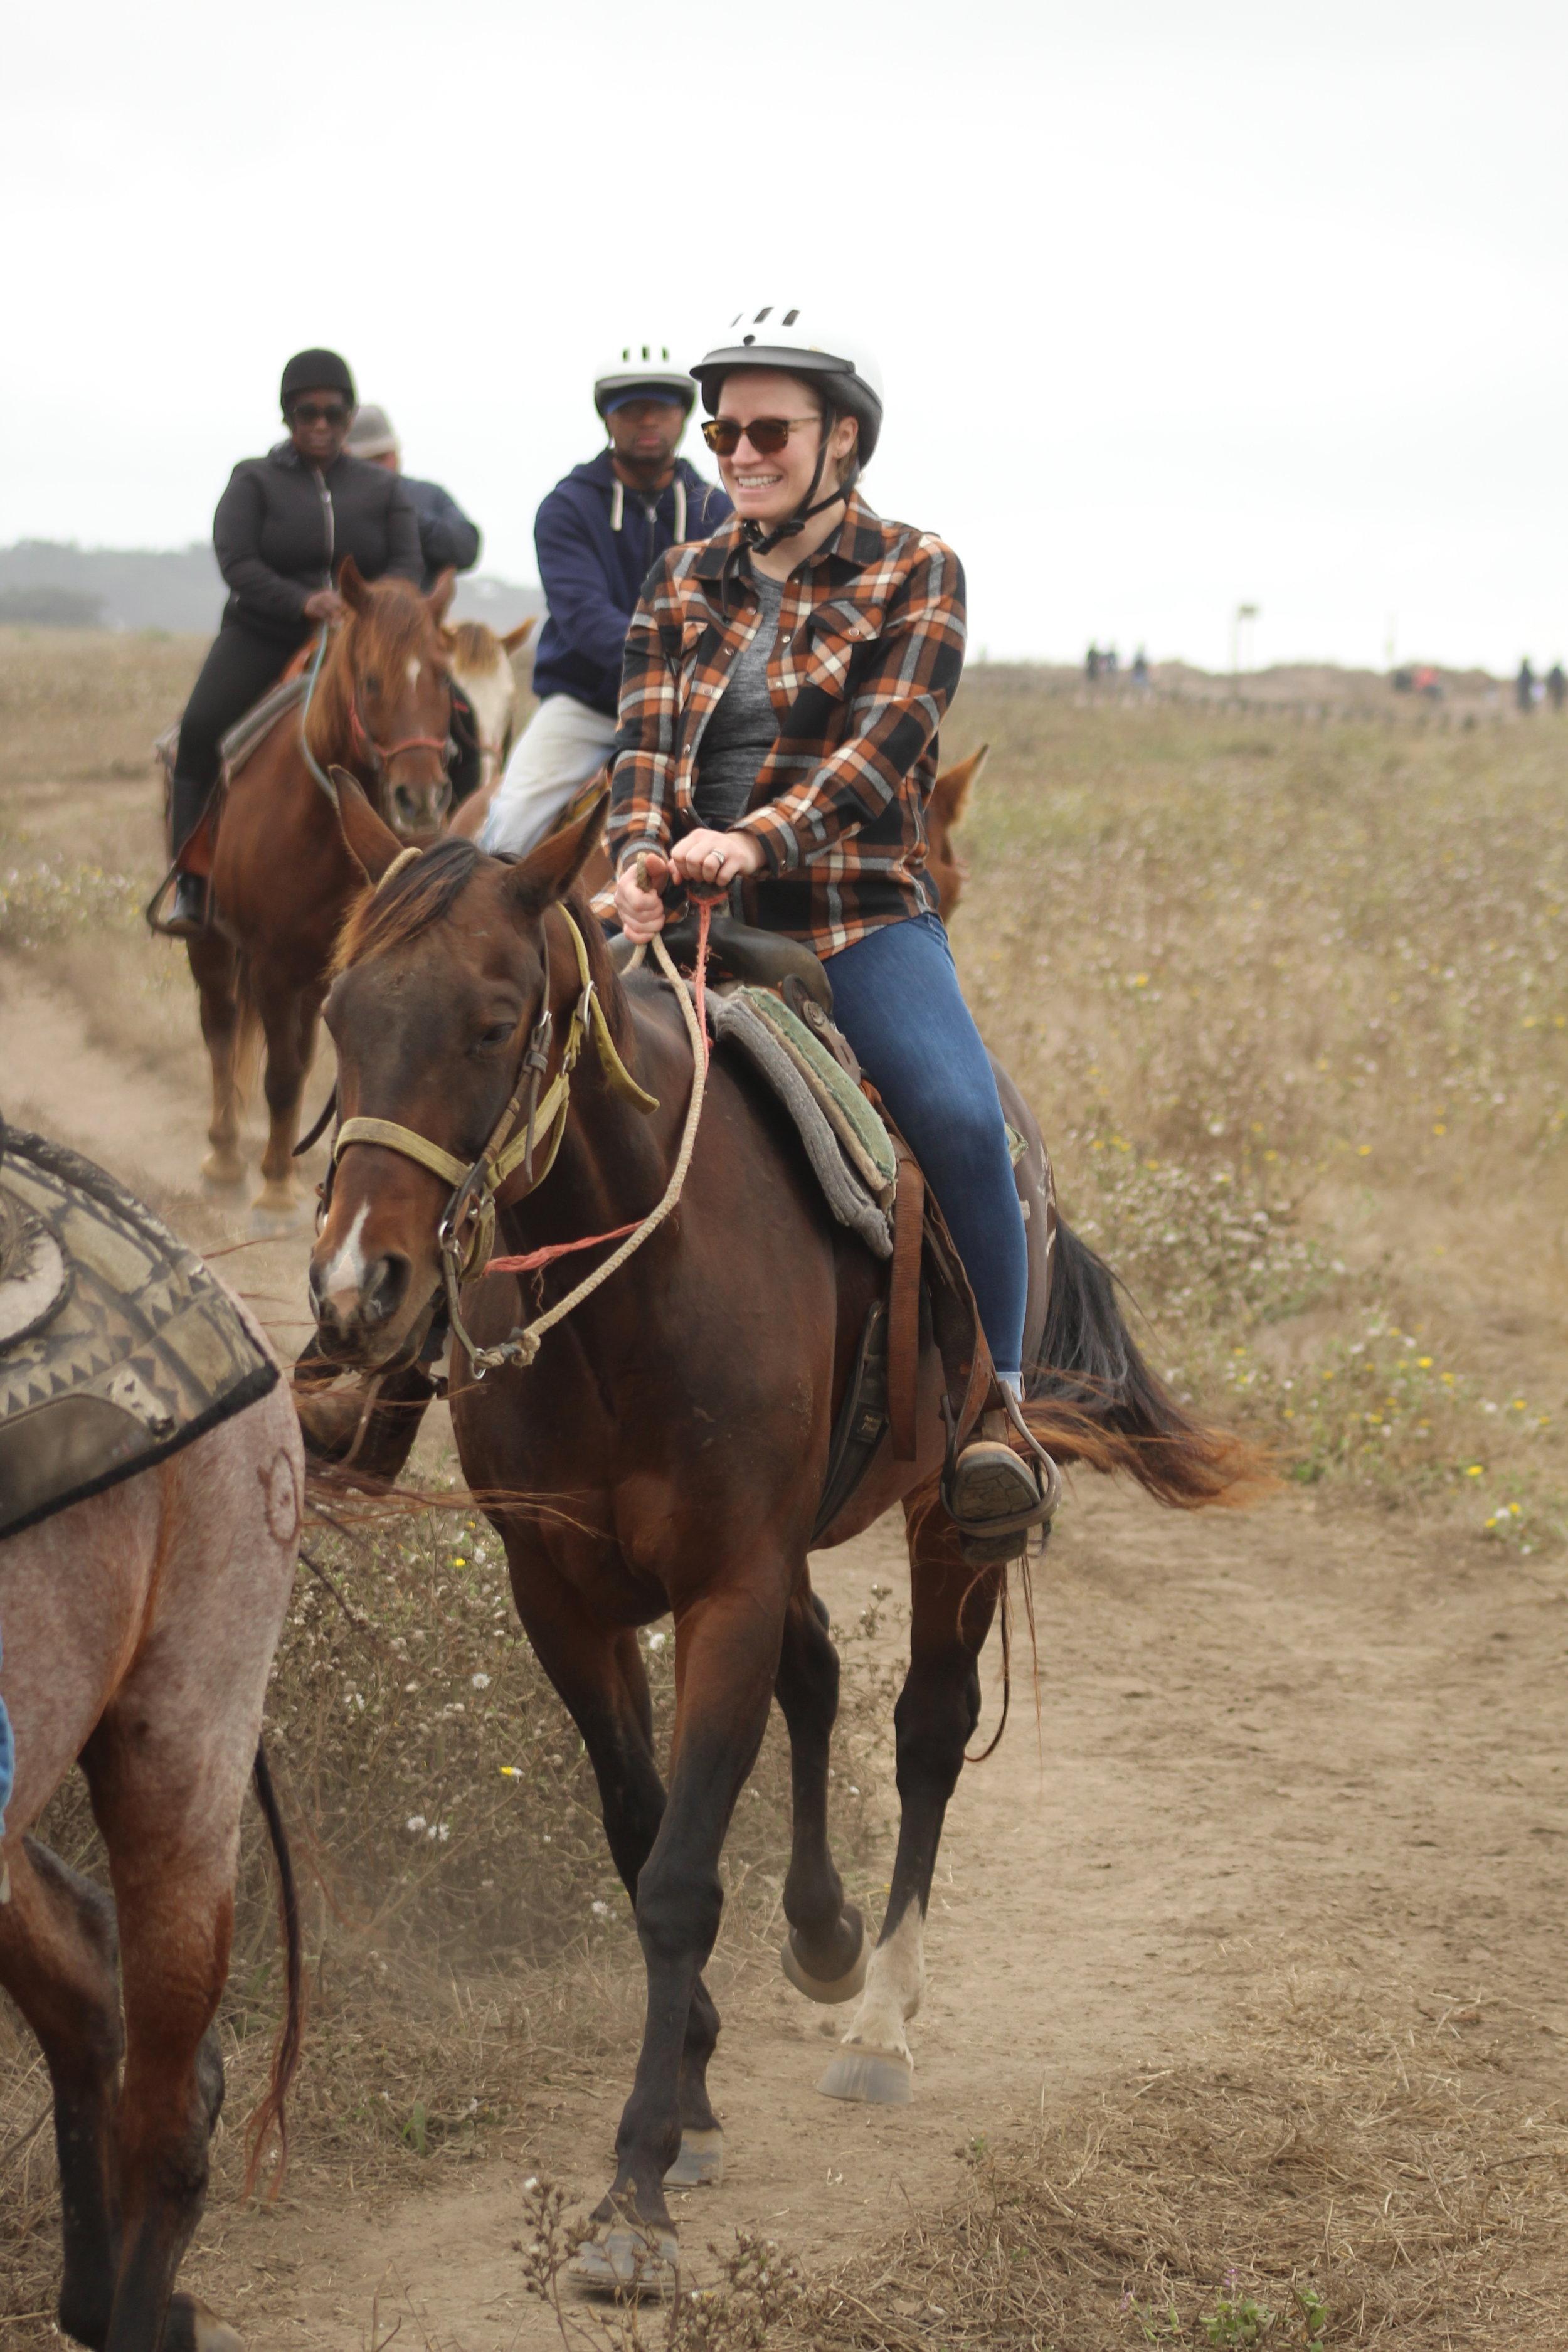 Horseback riding in Half Moon Bay